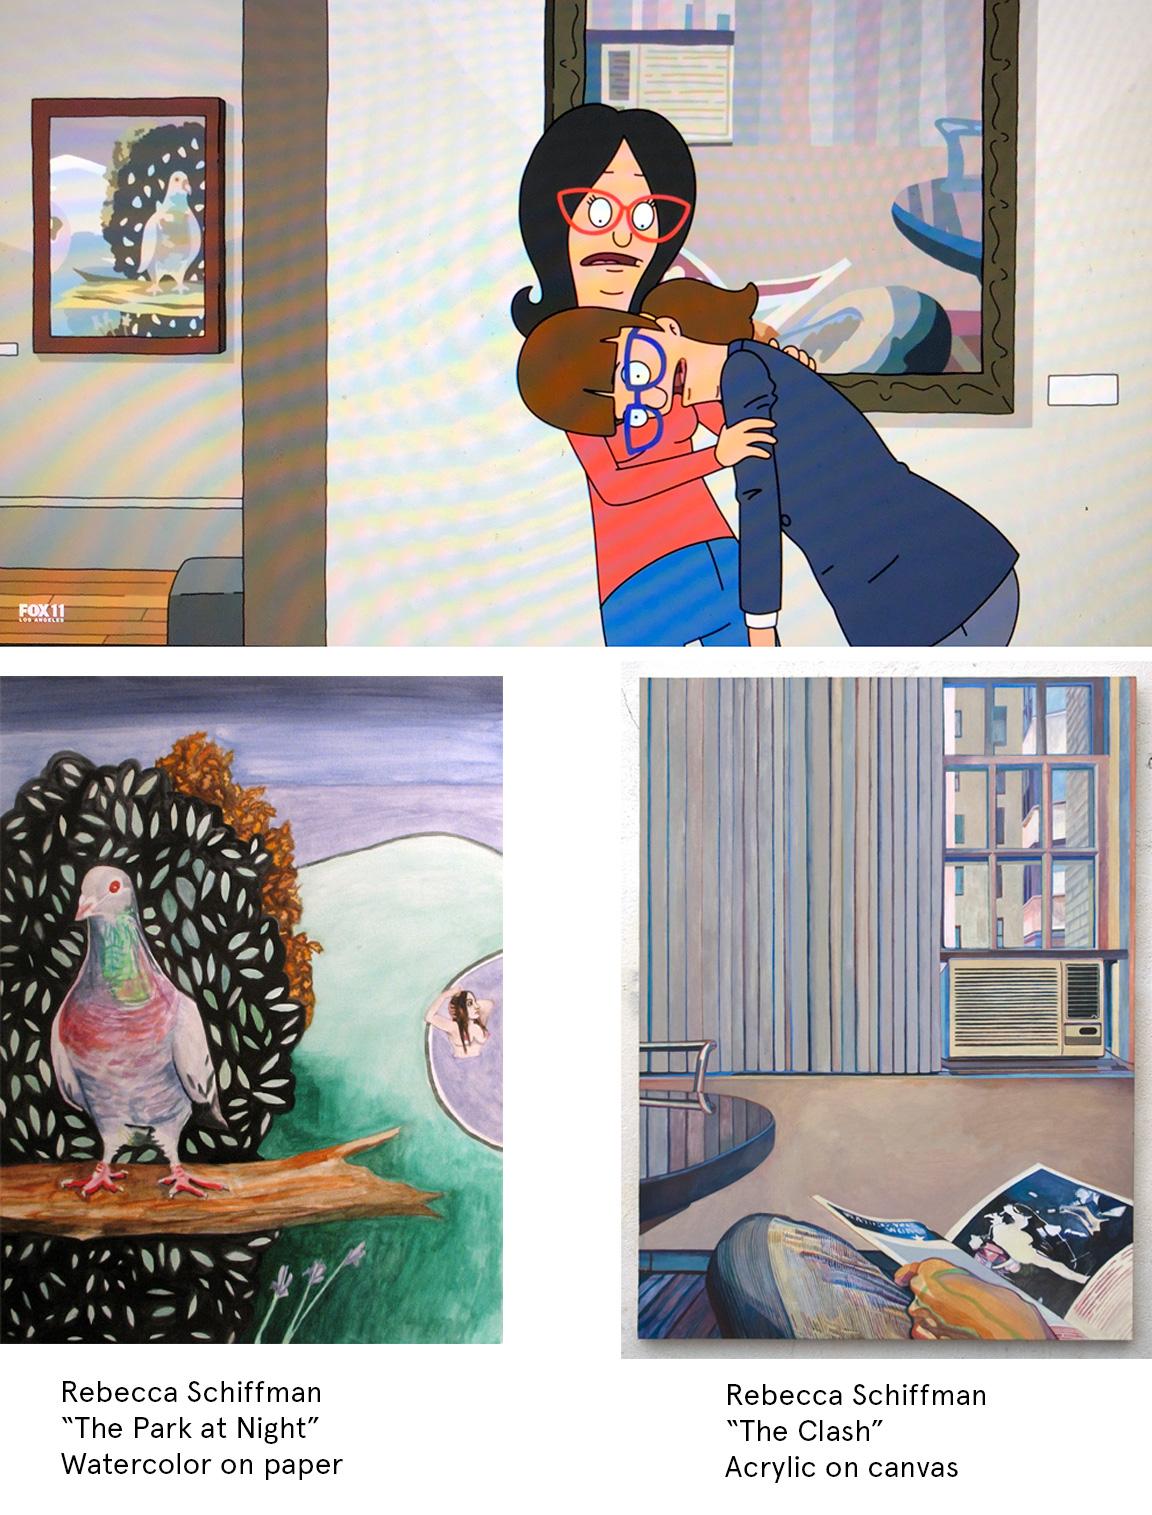 RebeccaSchiffman_ParkClash_BobsBurgers_Collage